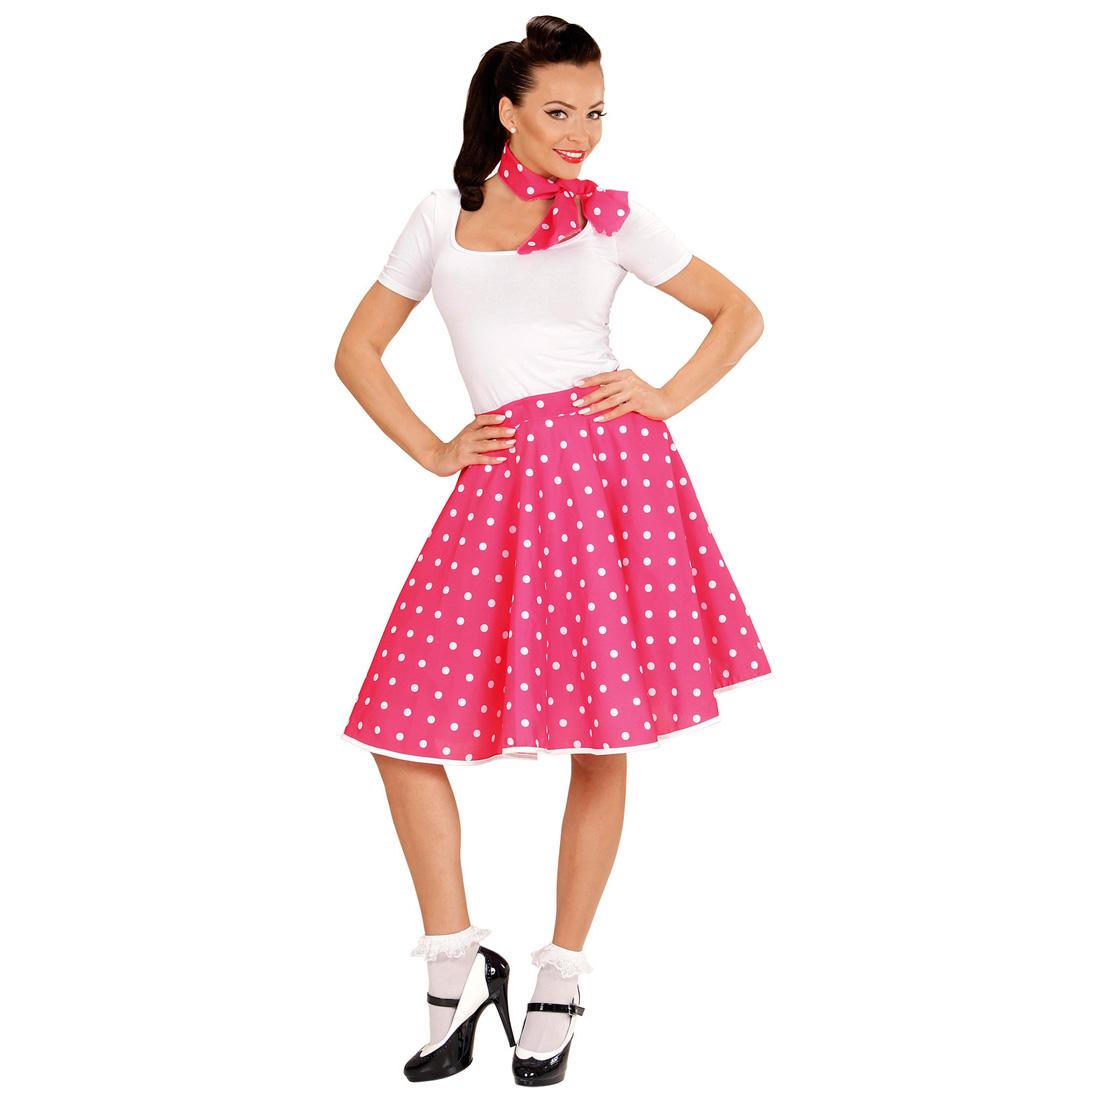 50er jahre damenrock pink tellerrock und halstuch polka. Black Bedroom Furniture Sets. Home Design Ideas